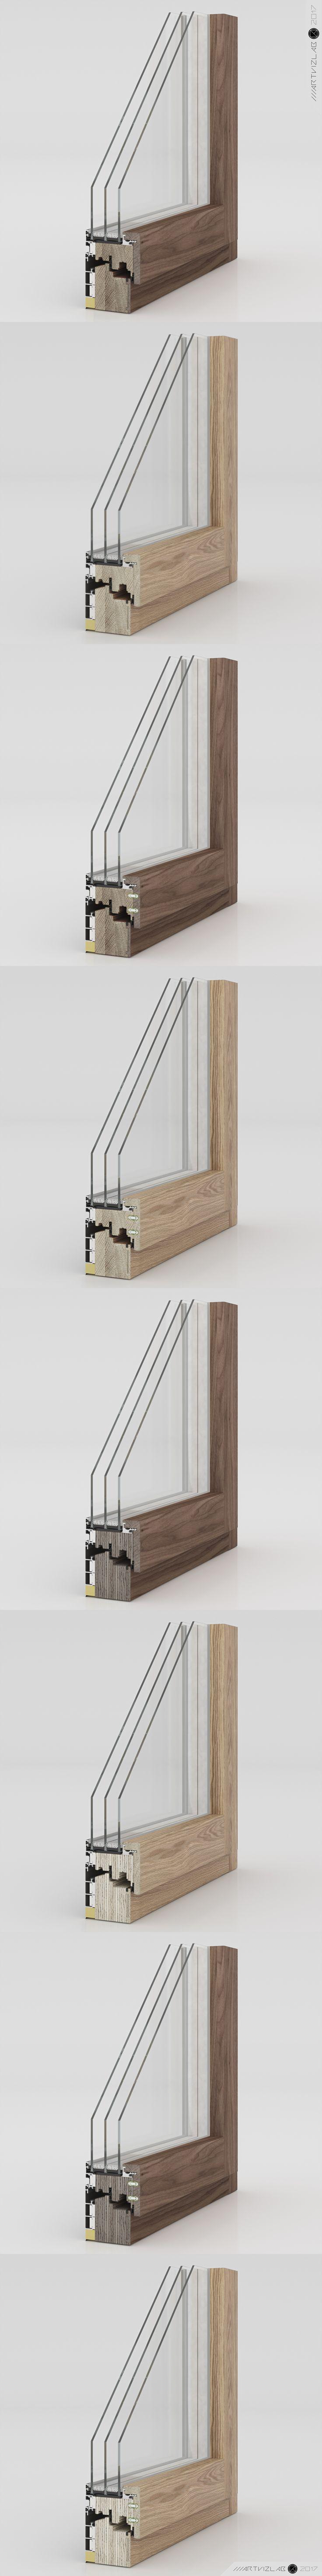 ARTVIZLAB | Закажите 3d модели у нас и получите скидку 13%! | пишите на 3d@artvizlab.com #art #rendering #скидка #артвизлаб #3d #cg #walnut #wood #glass #oak #windows #doors